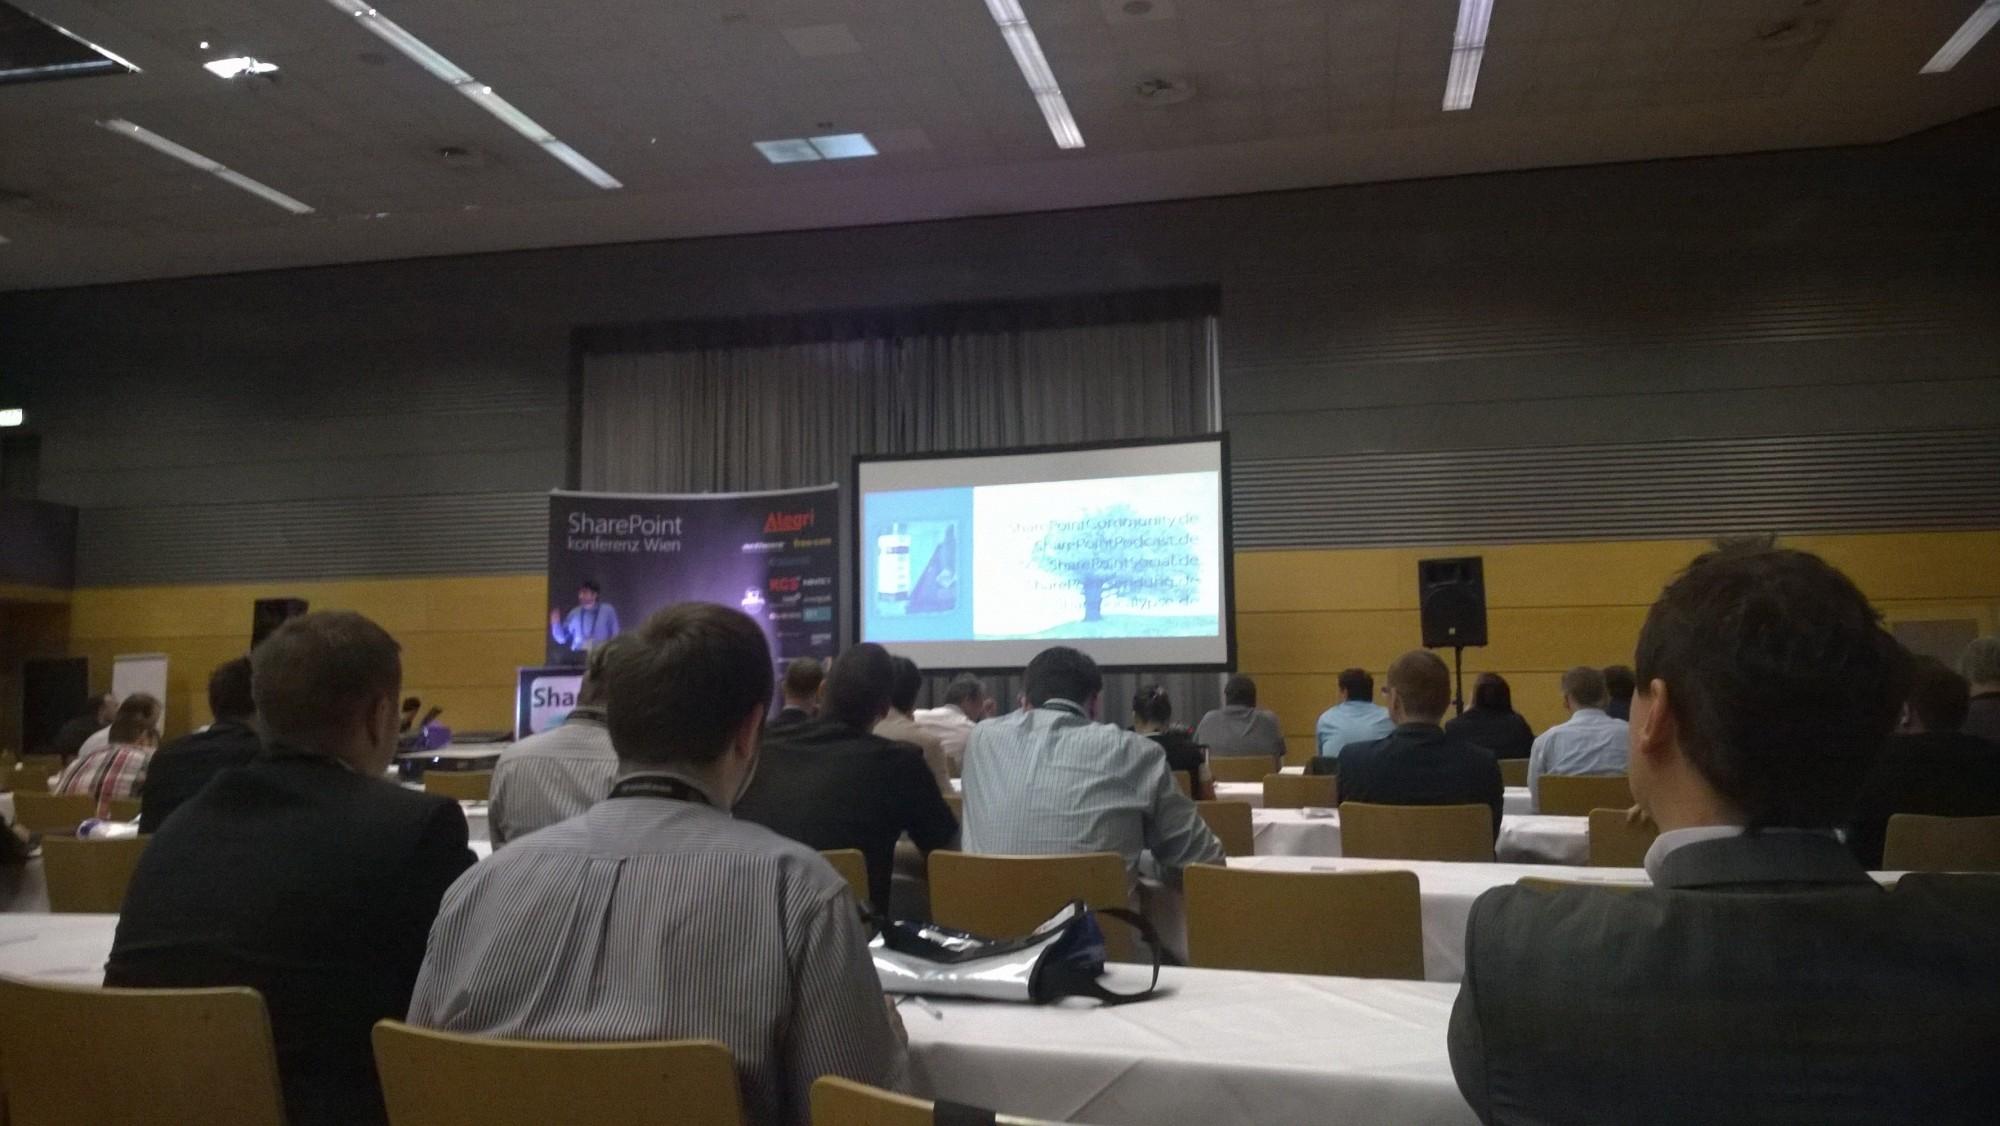 Sharepoint Konferenz 2014 Wien